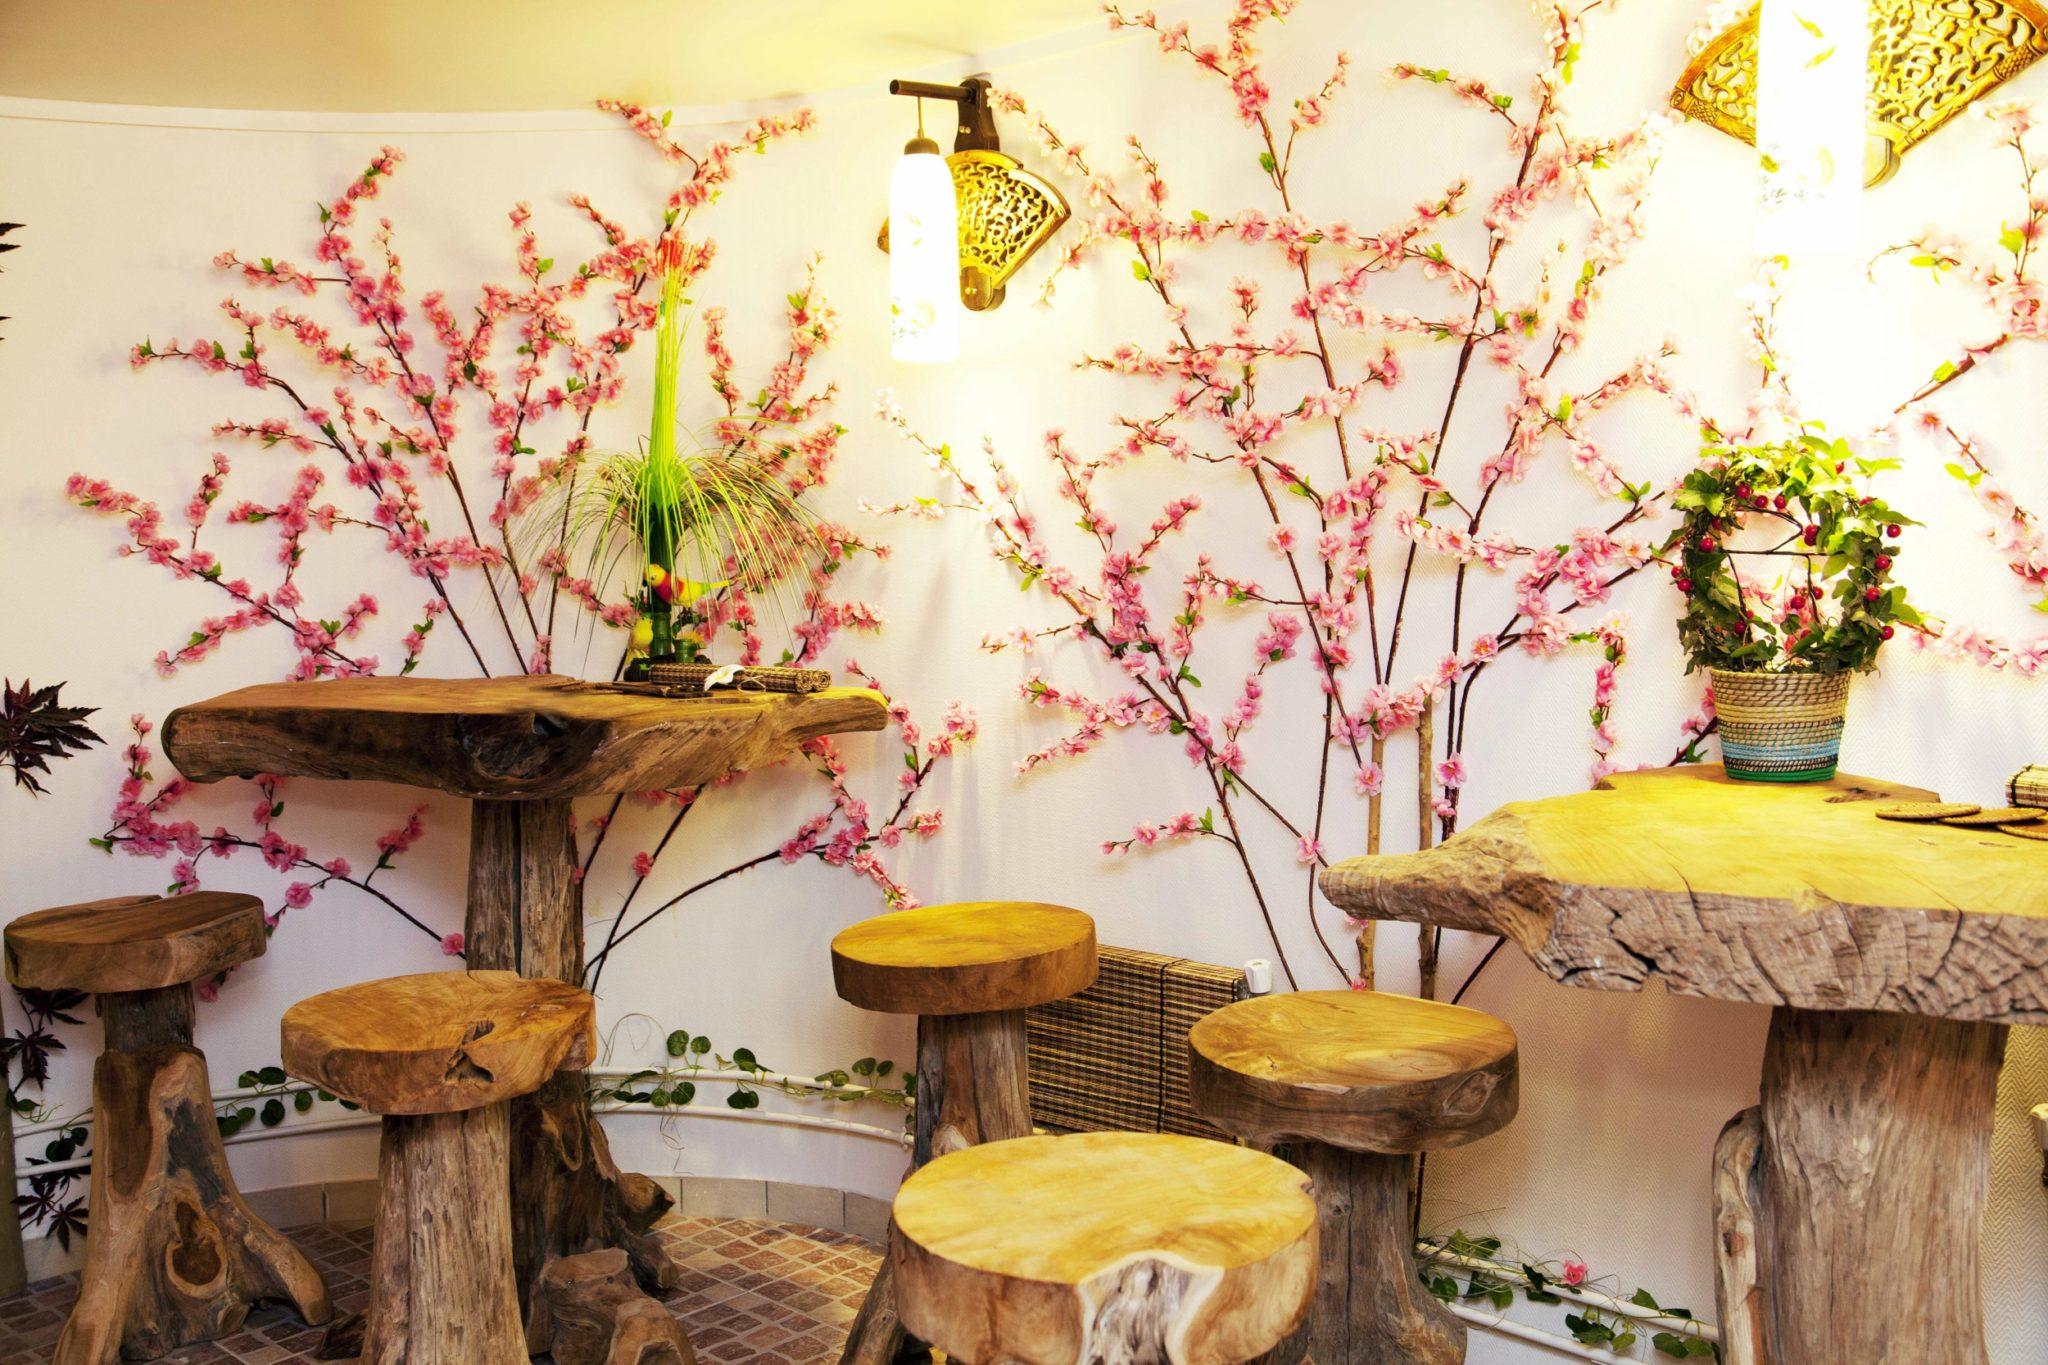 lanqi spa massage traditionnel chinois paris 03 1